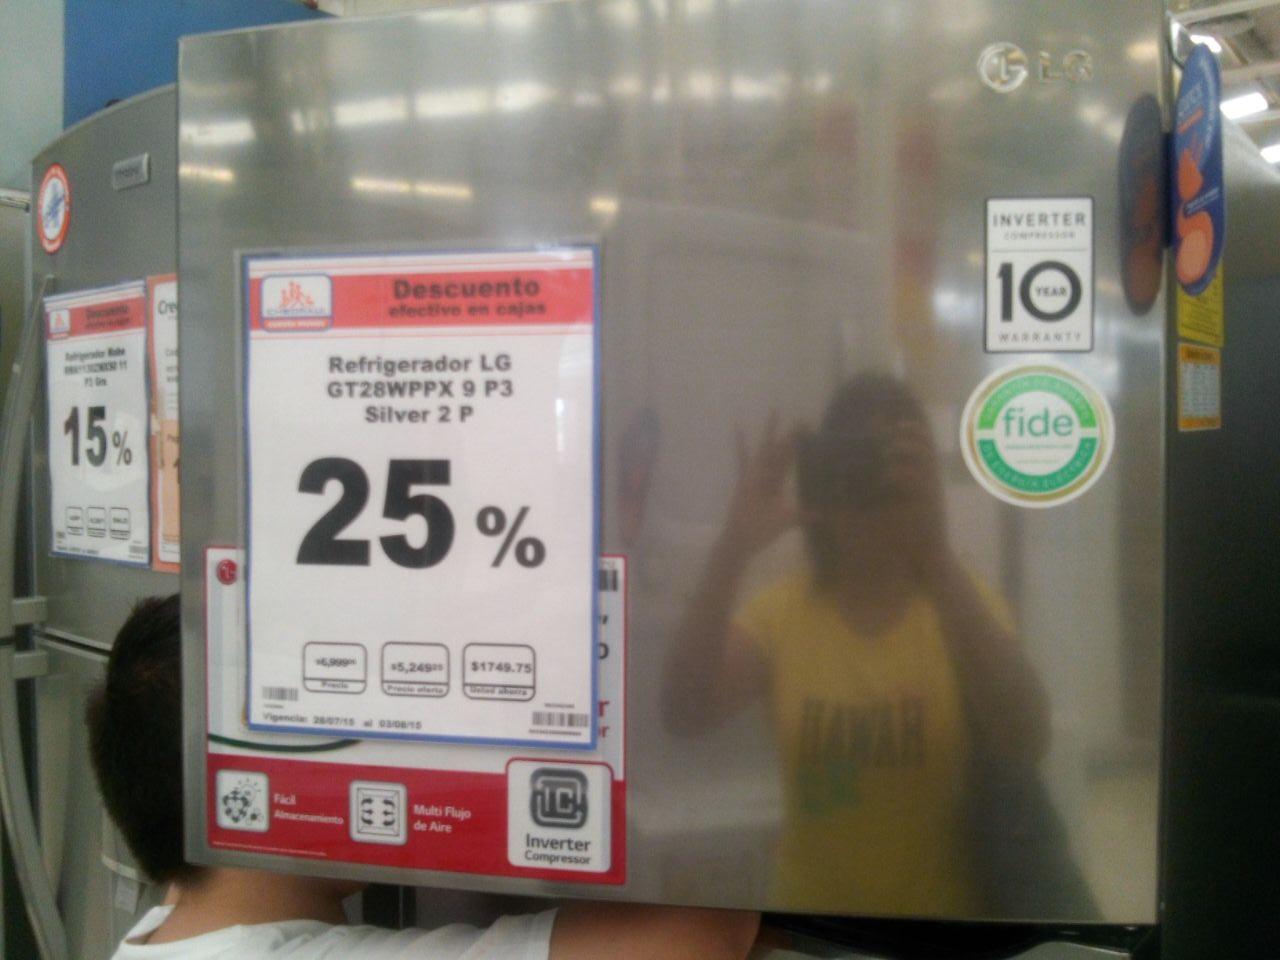 Chedraui: Refrigerador LG INVERTER GT28WPPX a $5,249.25